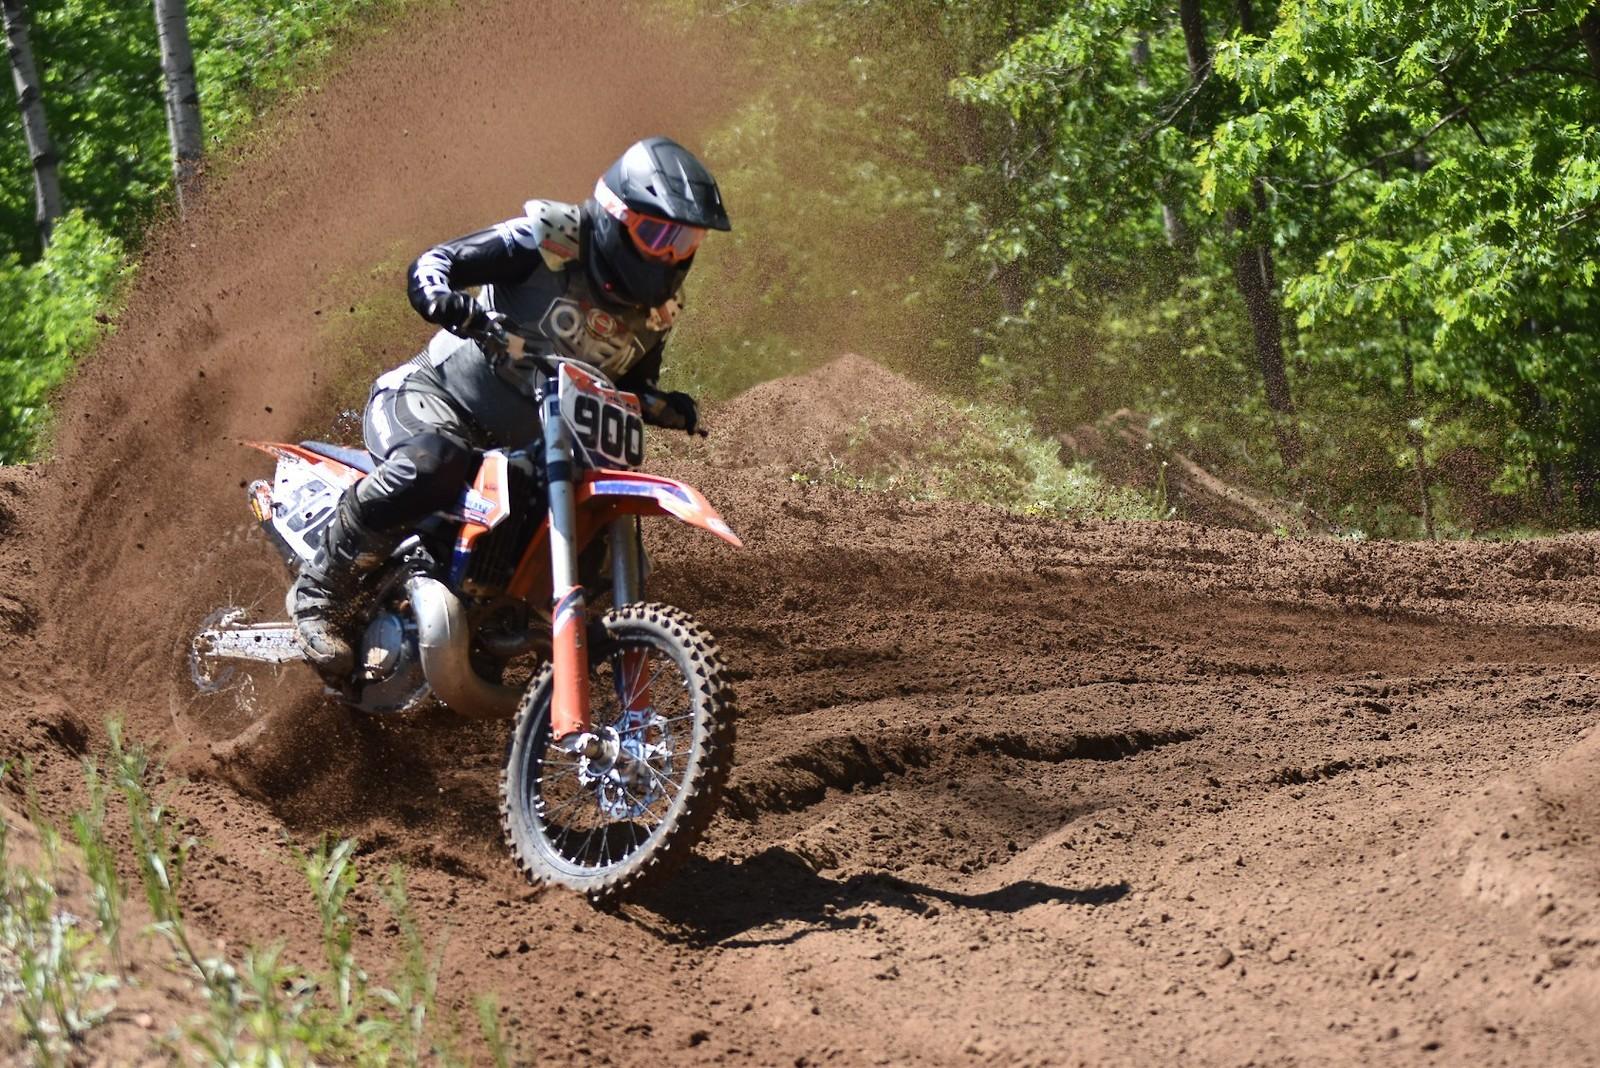 62307634 2256557137930043 1603194193608441856 o - Jeremy_Jonas - Motocross Pictures - Vital MX